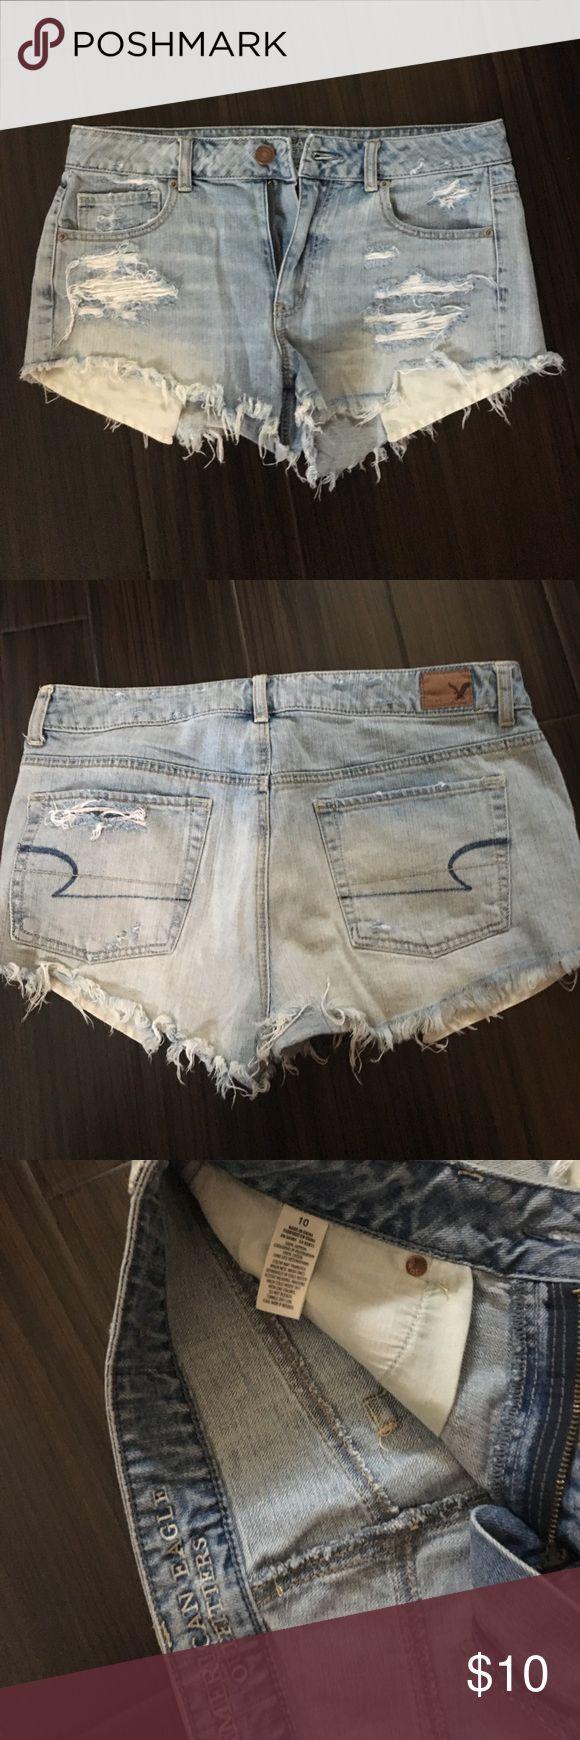 American Eagle festival cut off shorts American Eagle Festival Style Jean shorts. Size 10. American Eagle Outfitters Shorts Jean Shorts